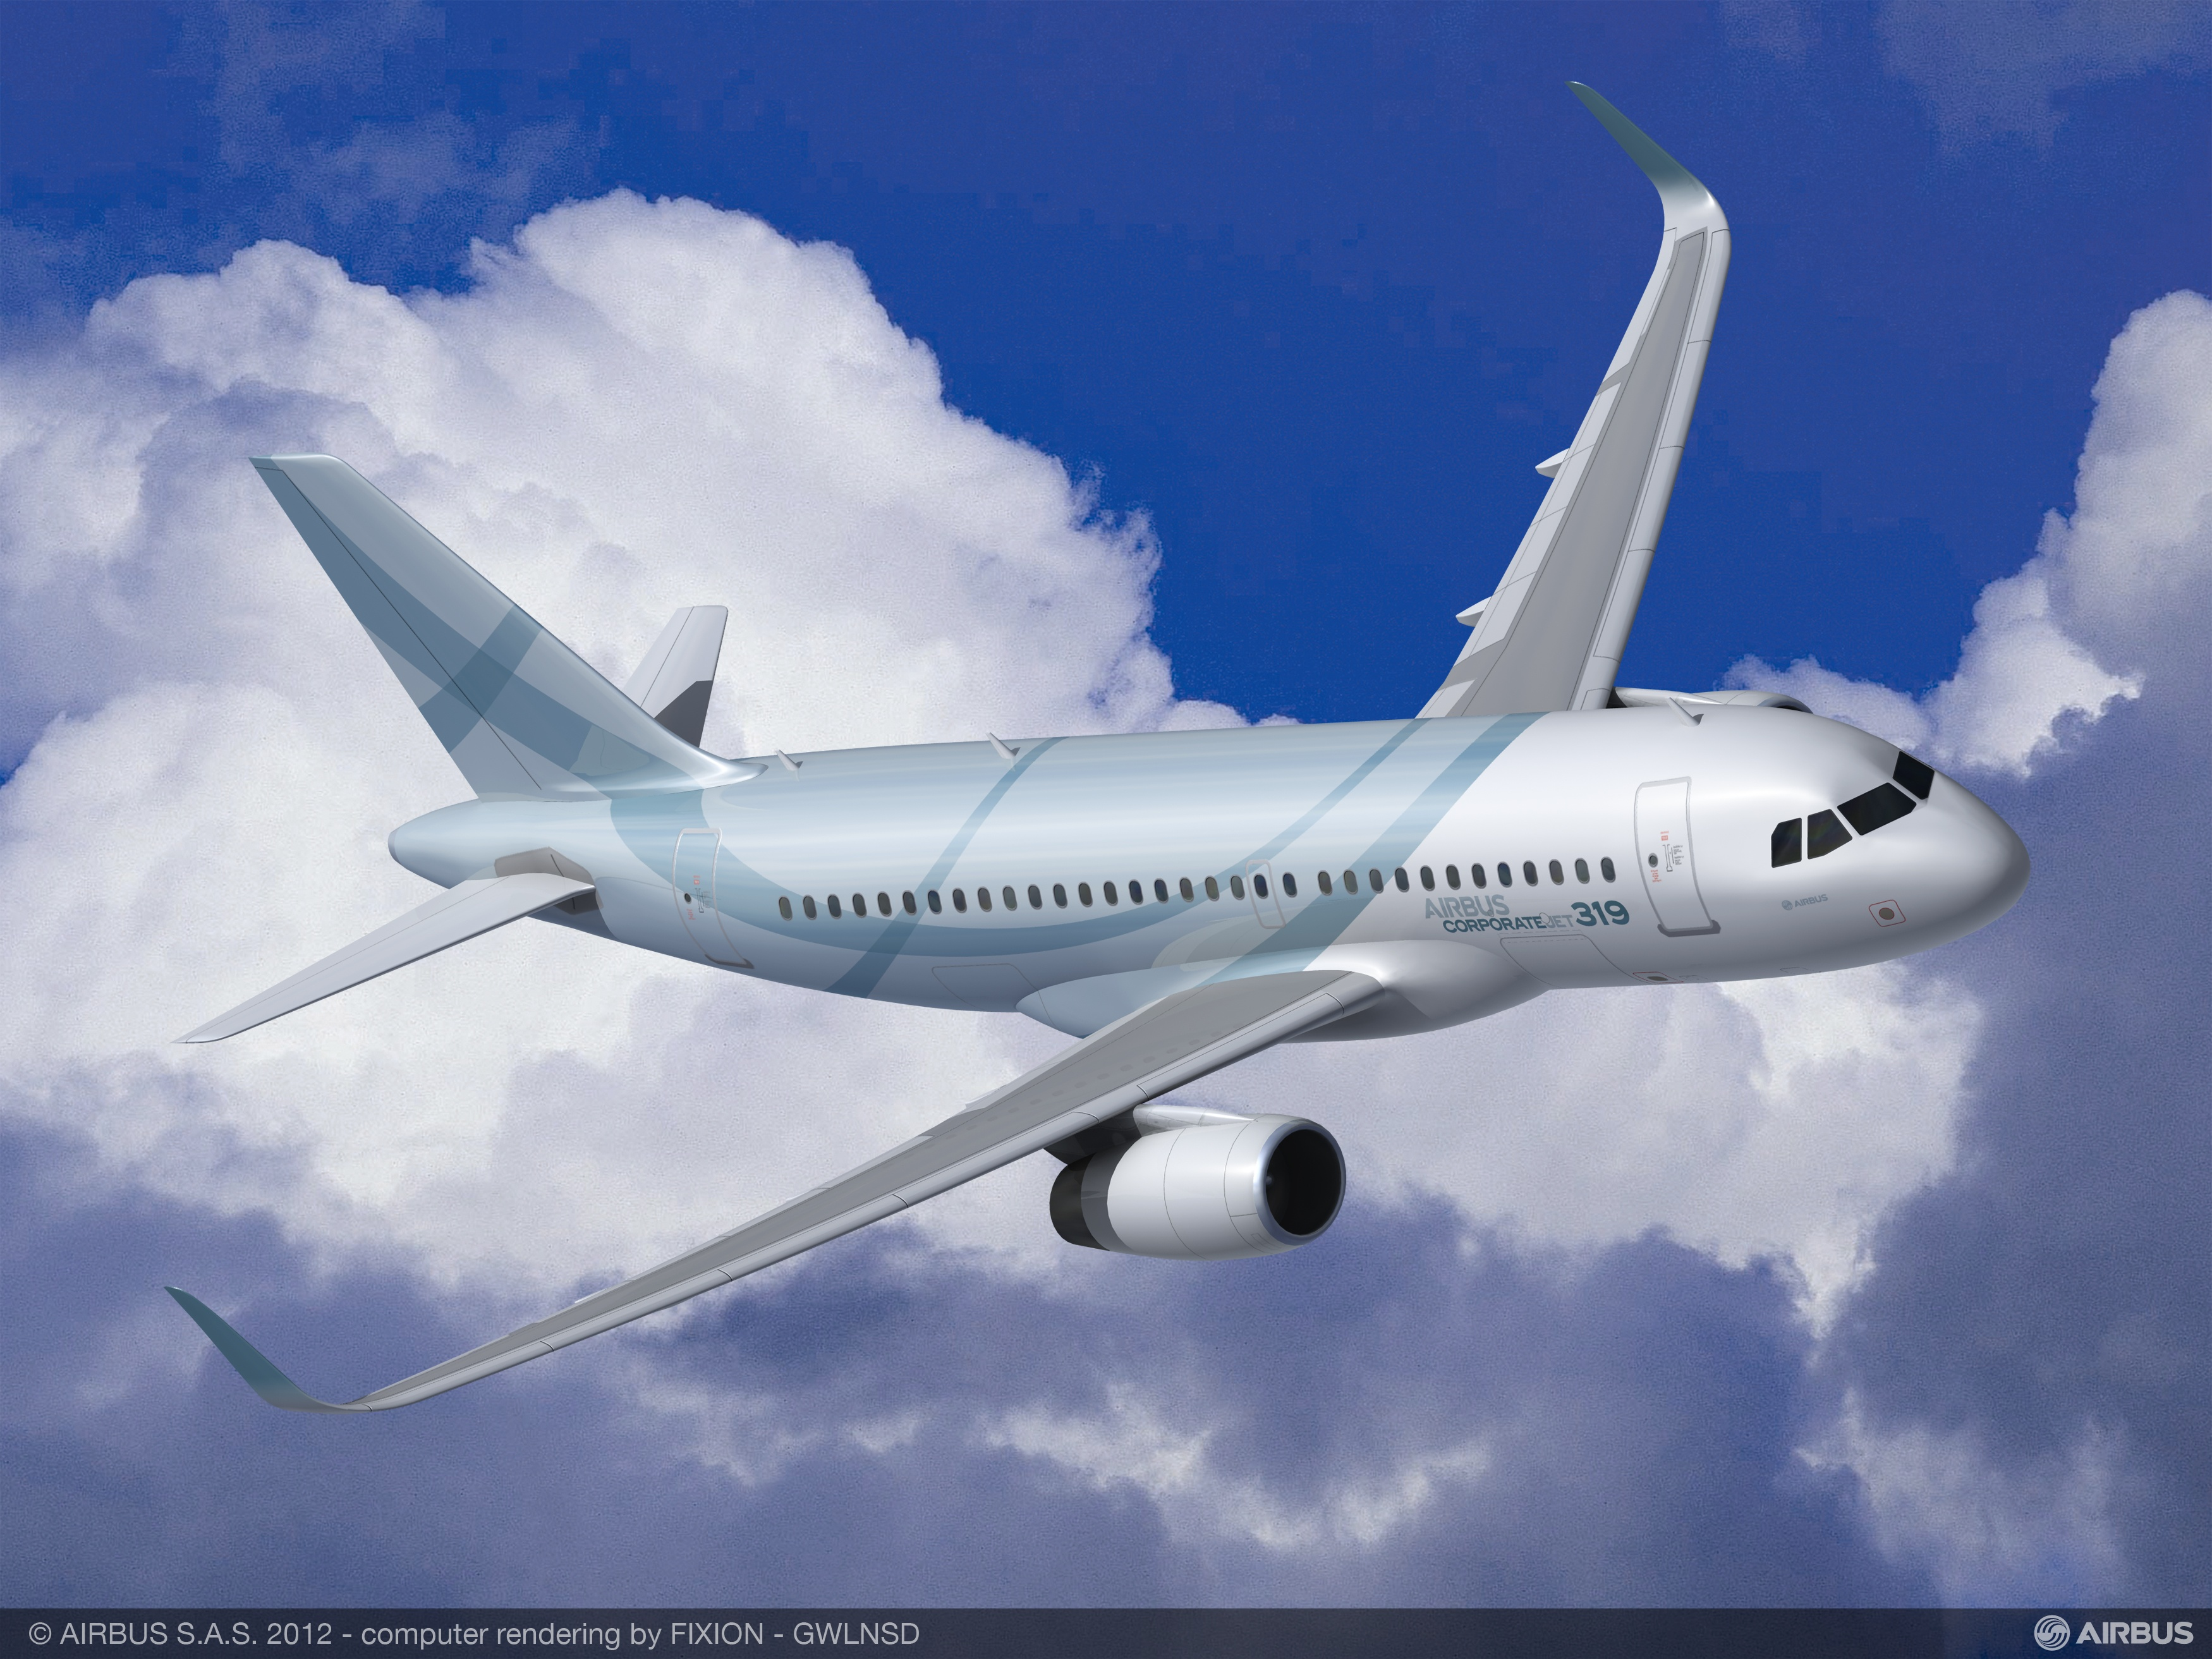 Airbus_ACJ319_Three-quarter_front.jpg